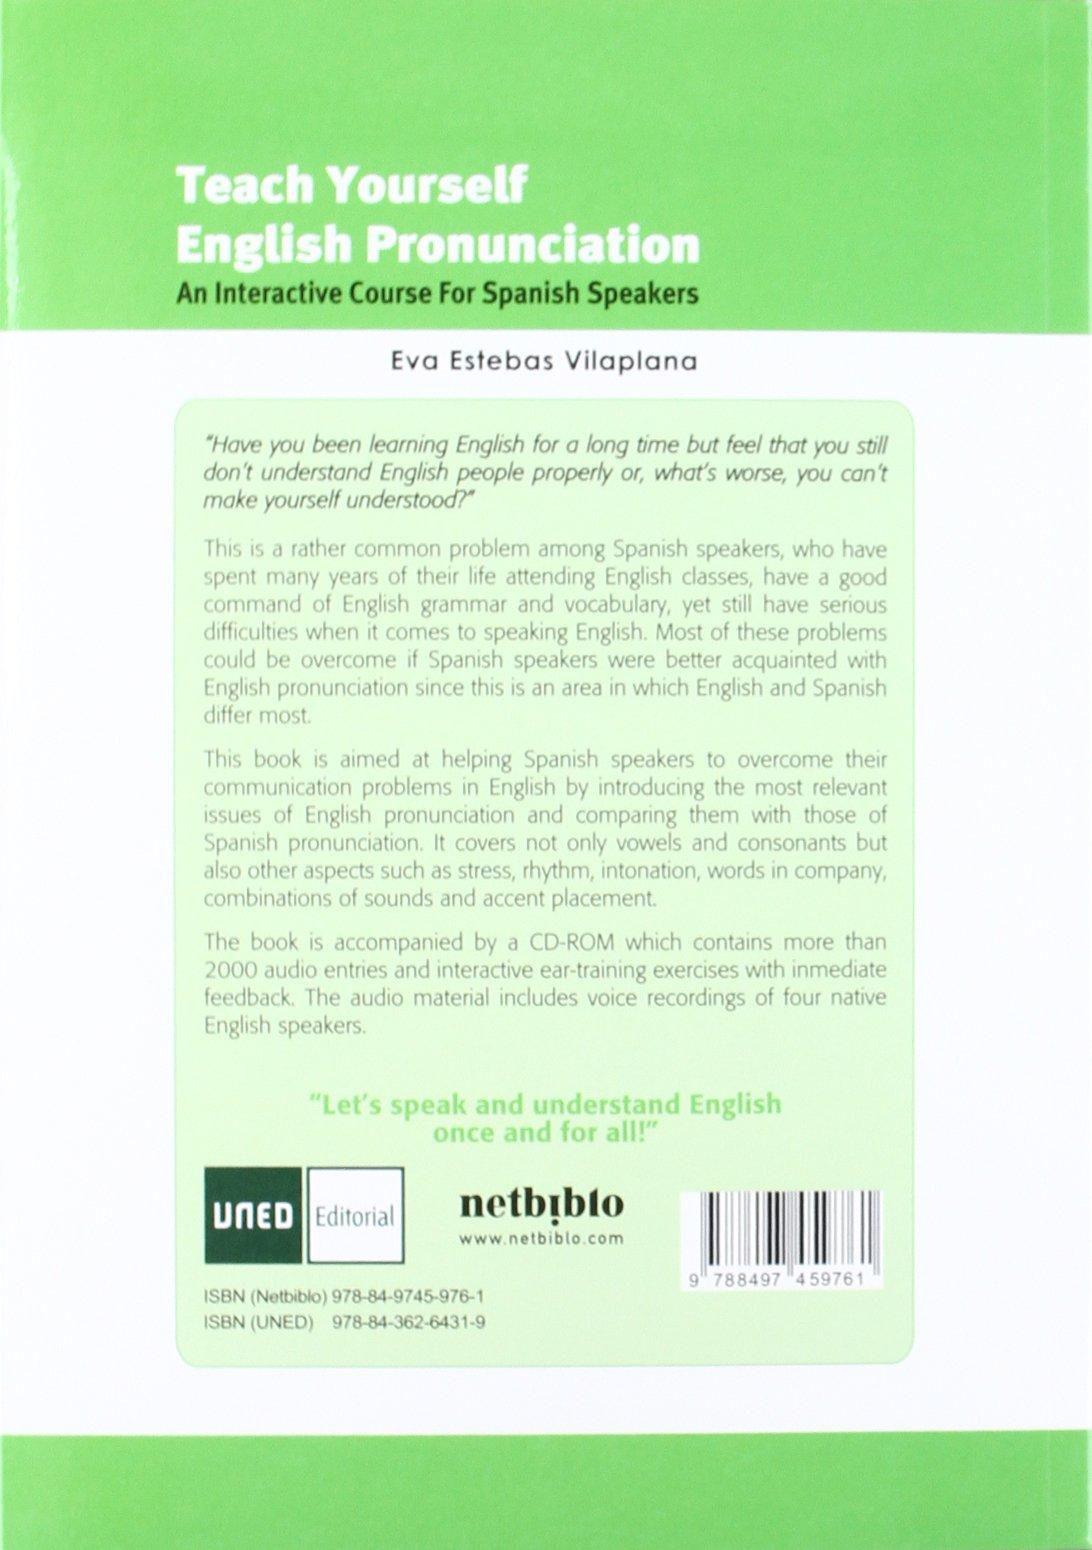 Teach yourself english pronunciation an interactive course for spanish speakers amazon co uk eva estebas vilaplana 9788497459761 books